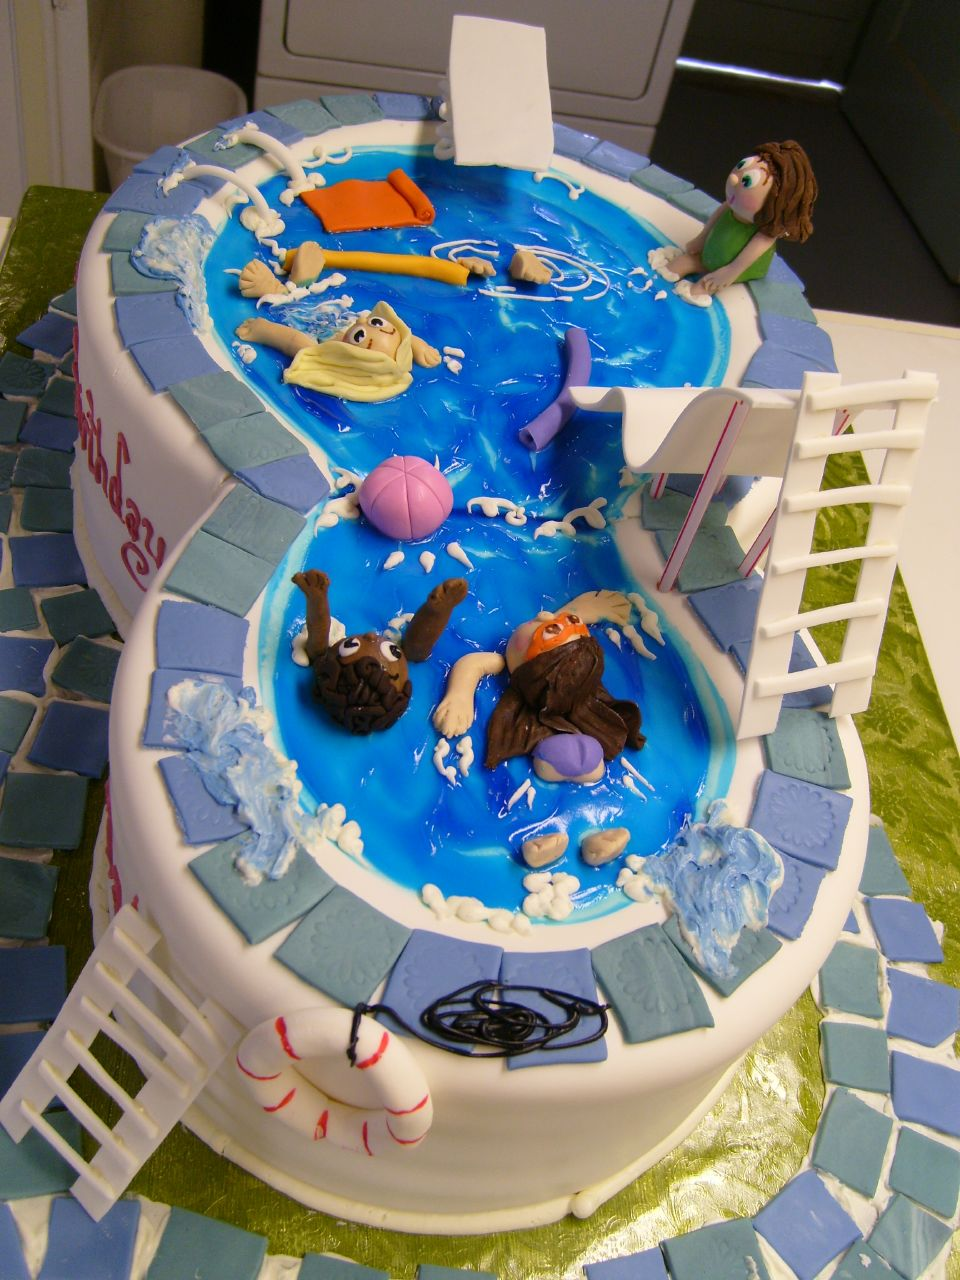 ~~Yummy Artistic Cream Cakes ~~ 275753,xcitefun-swimming-pool-cake